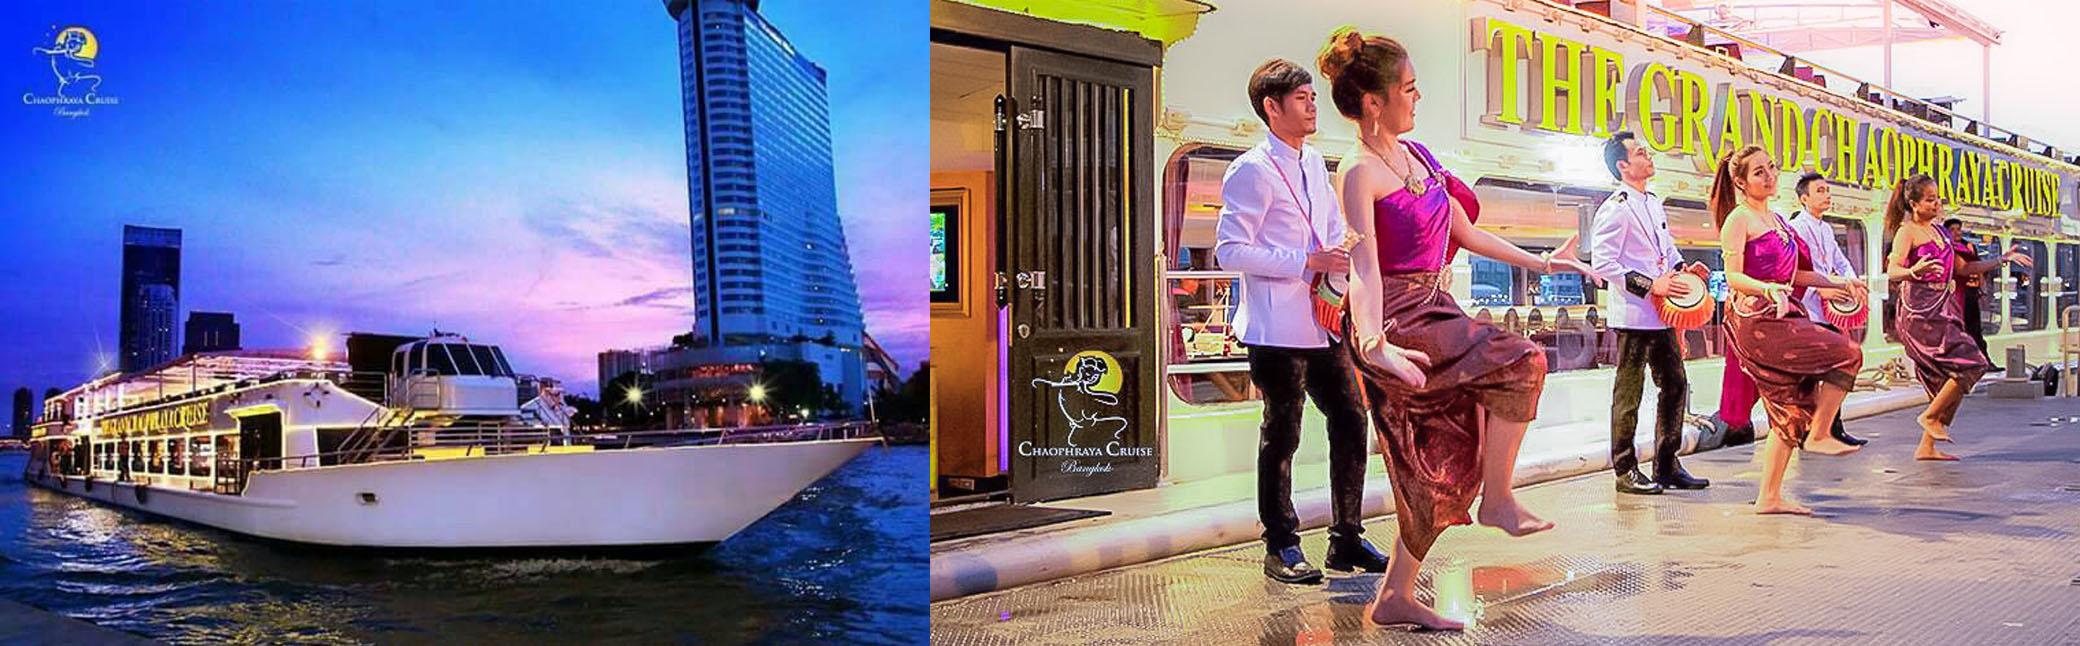 Chaophraya Cruise ล่องเรือแม่น้ำเจ้าพระยา ดินเนอร์  Seafood Buffet by เรือสำราญ